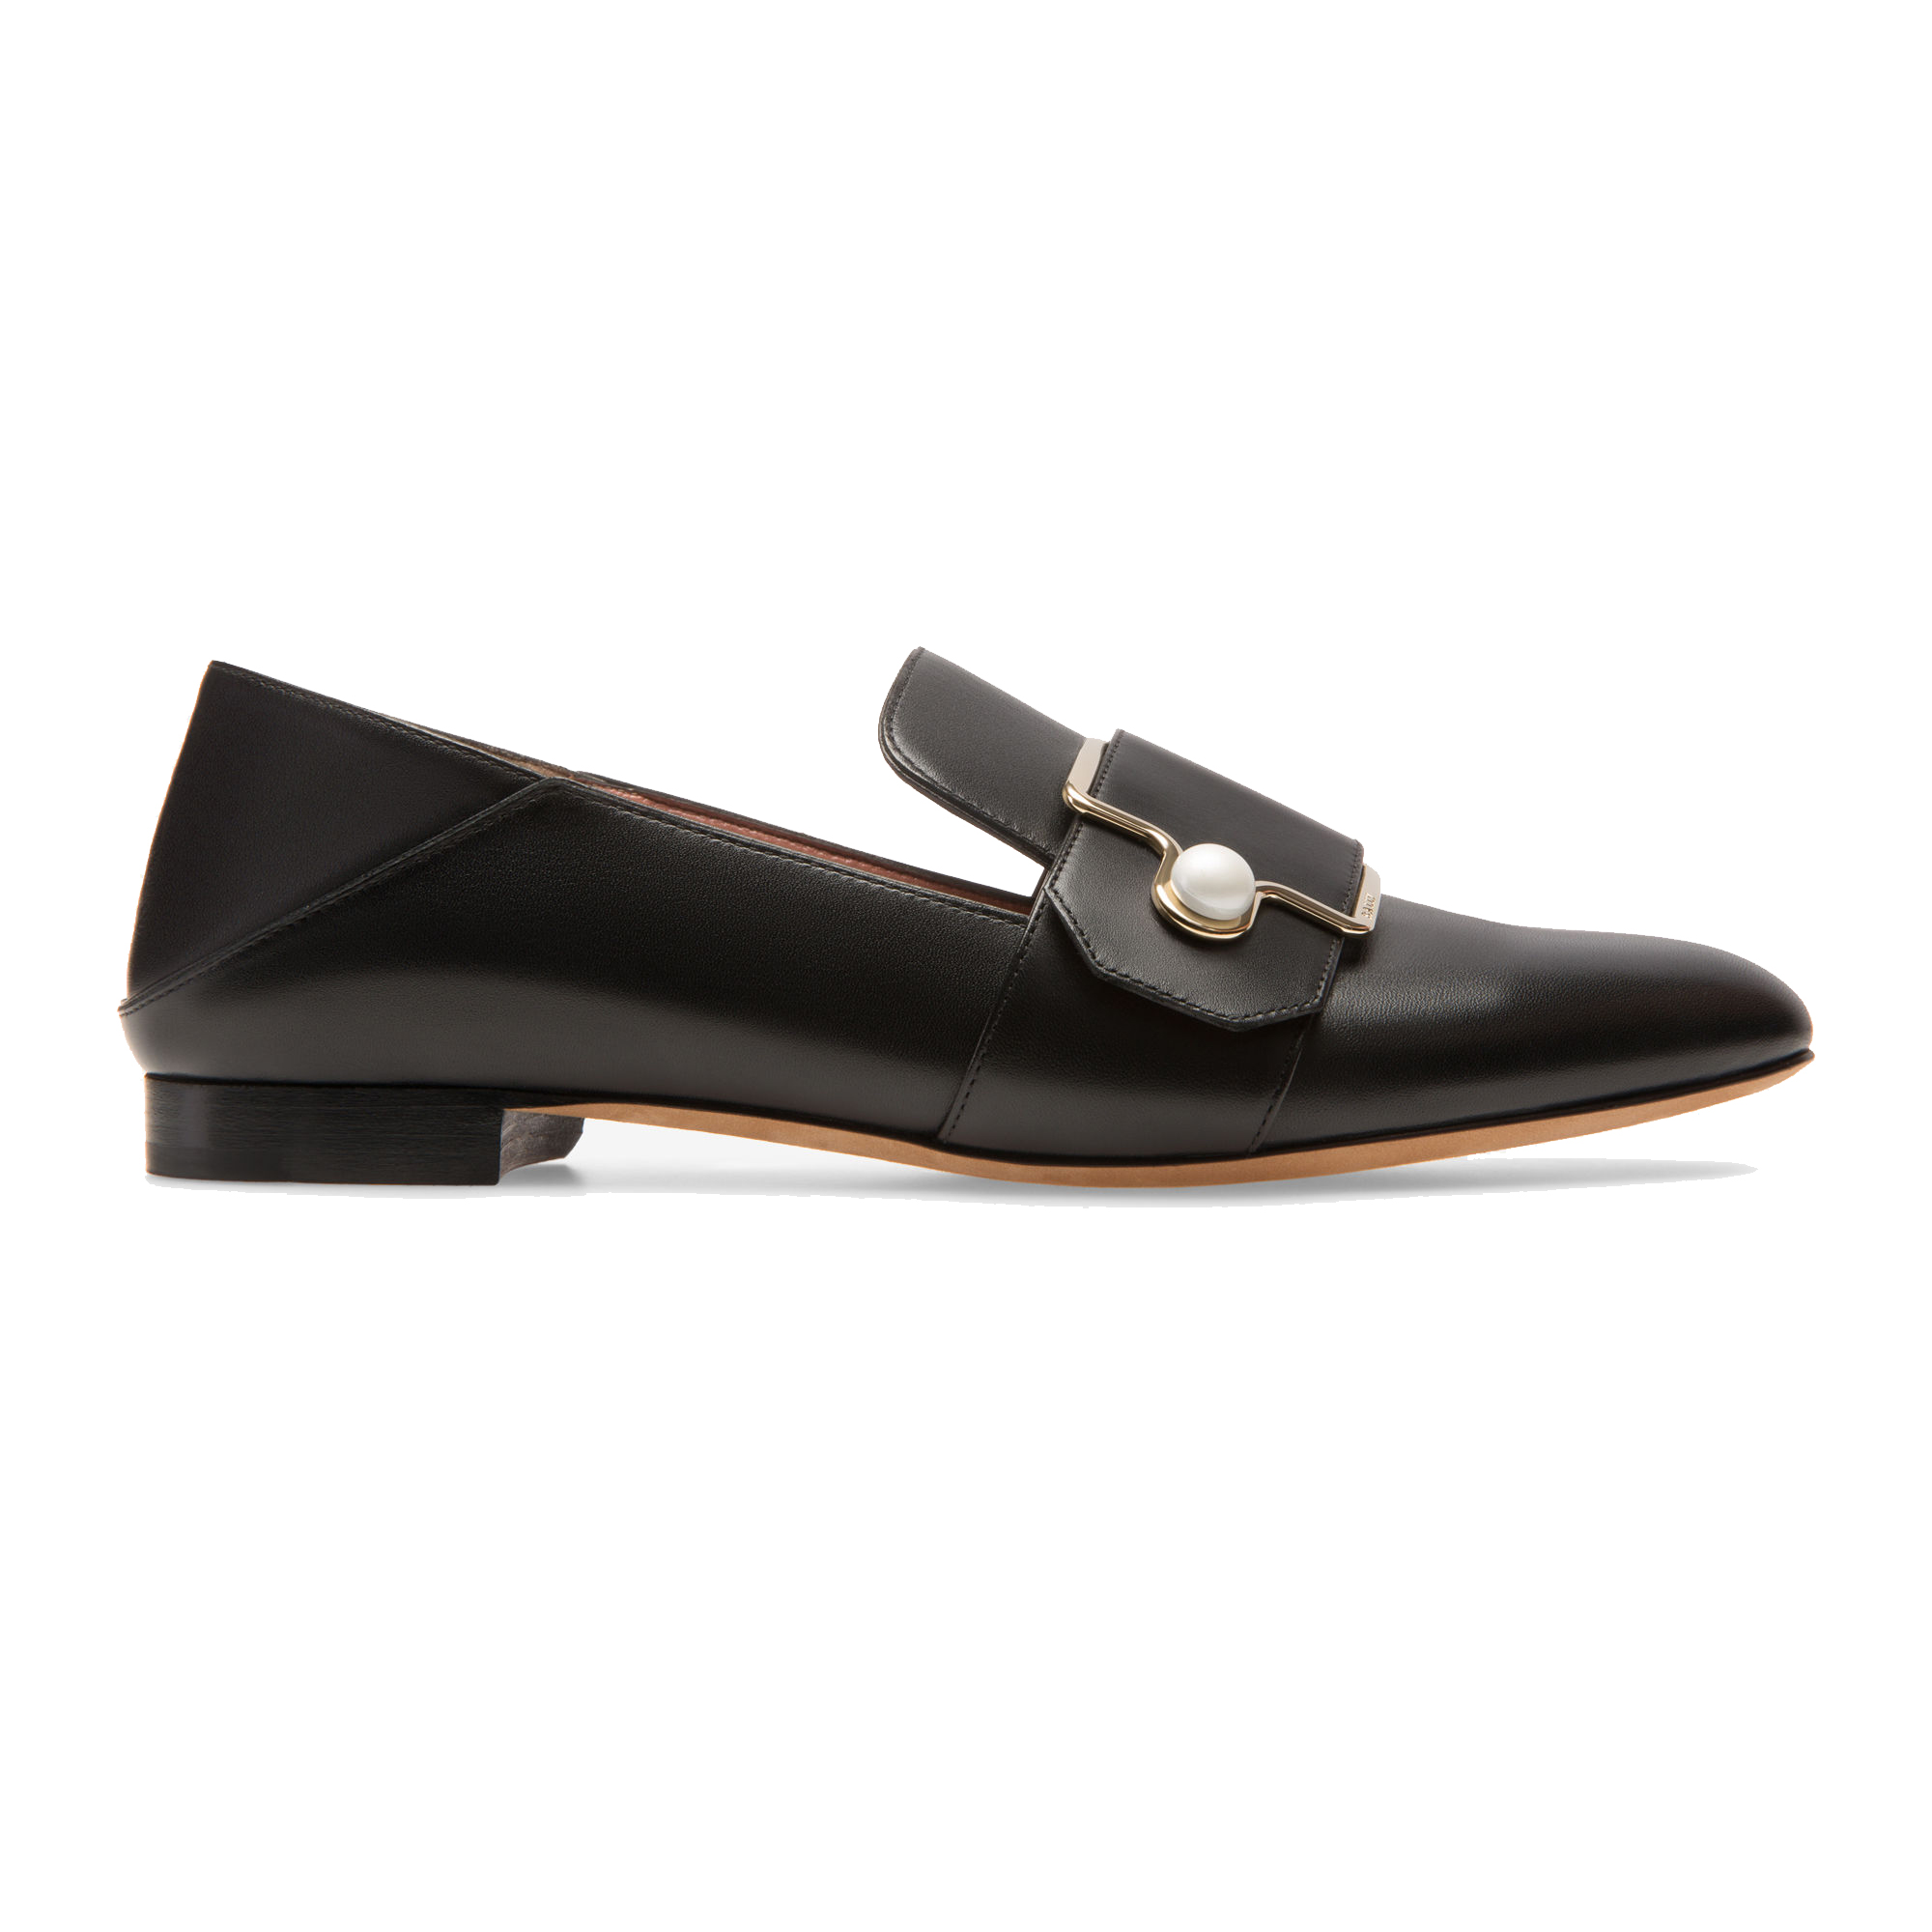 Bally Maelle Leather Slipper